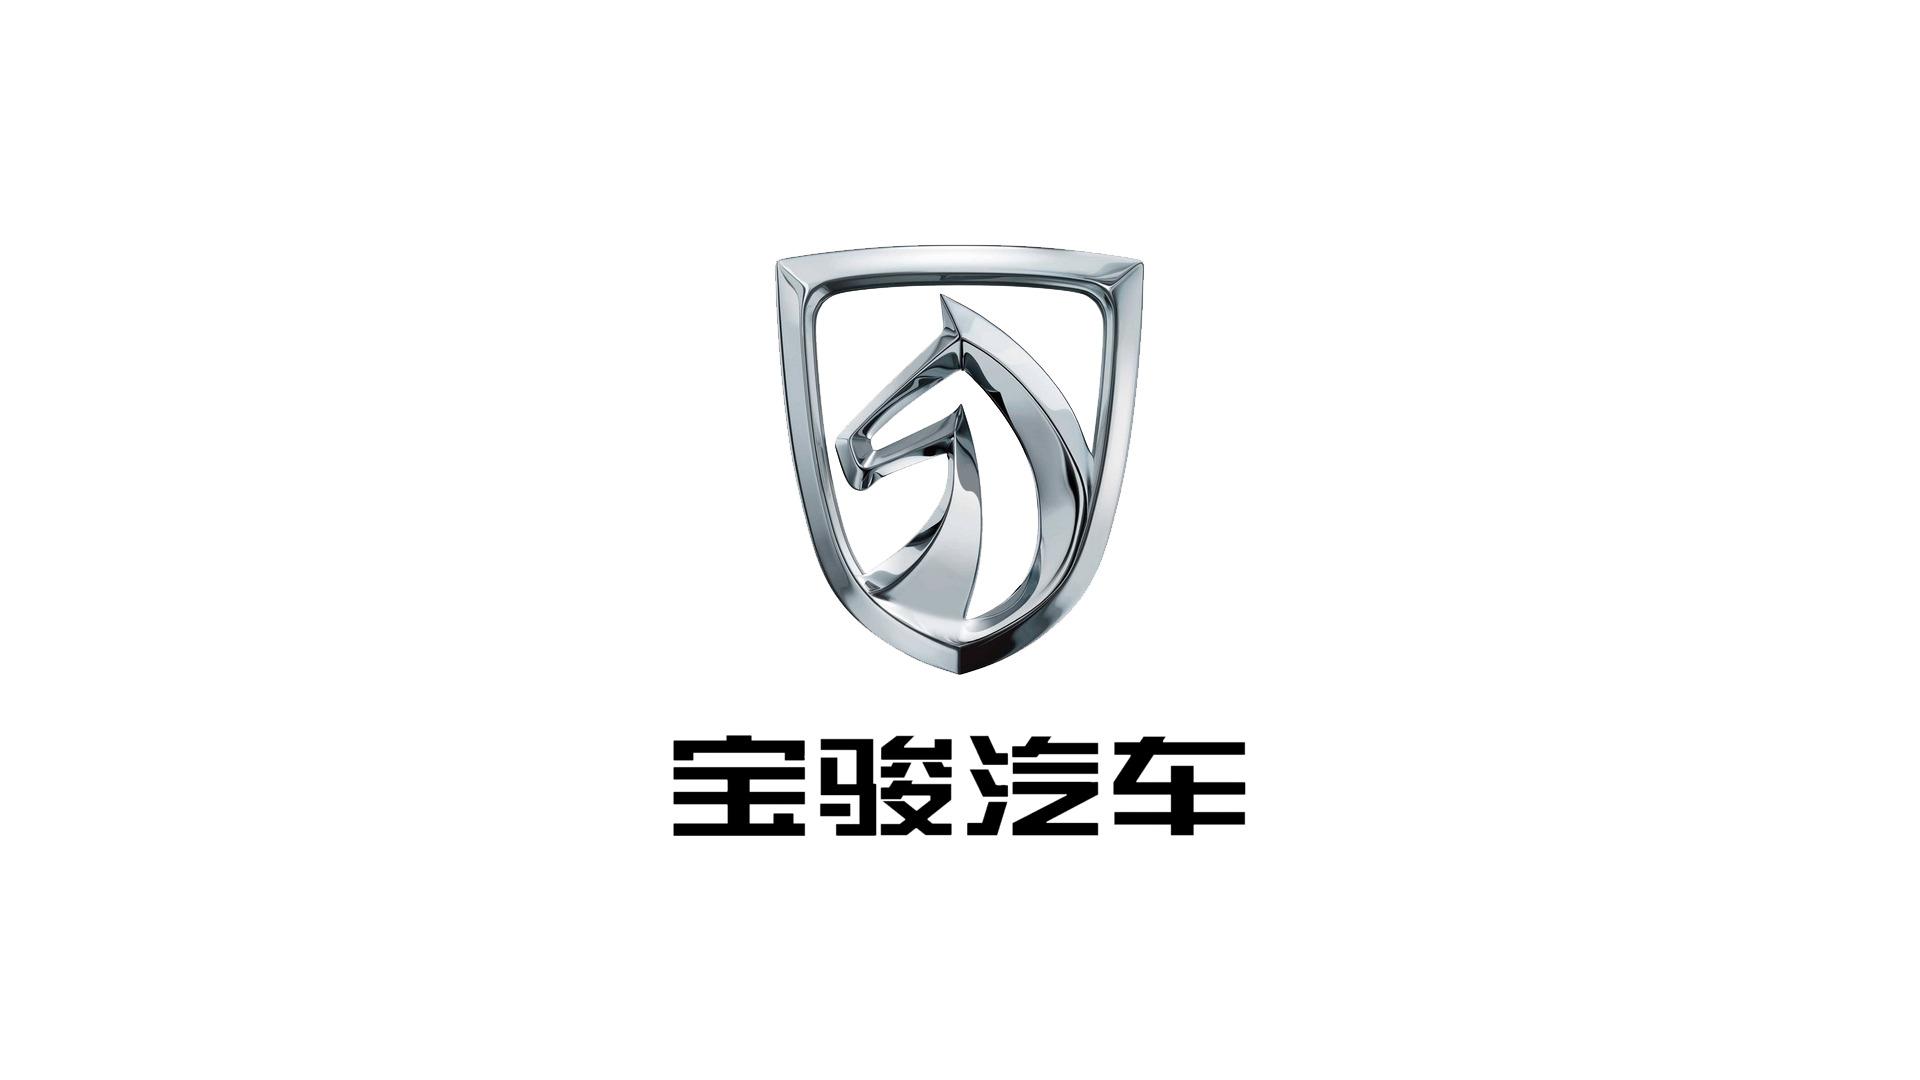 Imagen logo de Baojun